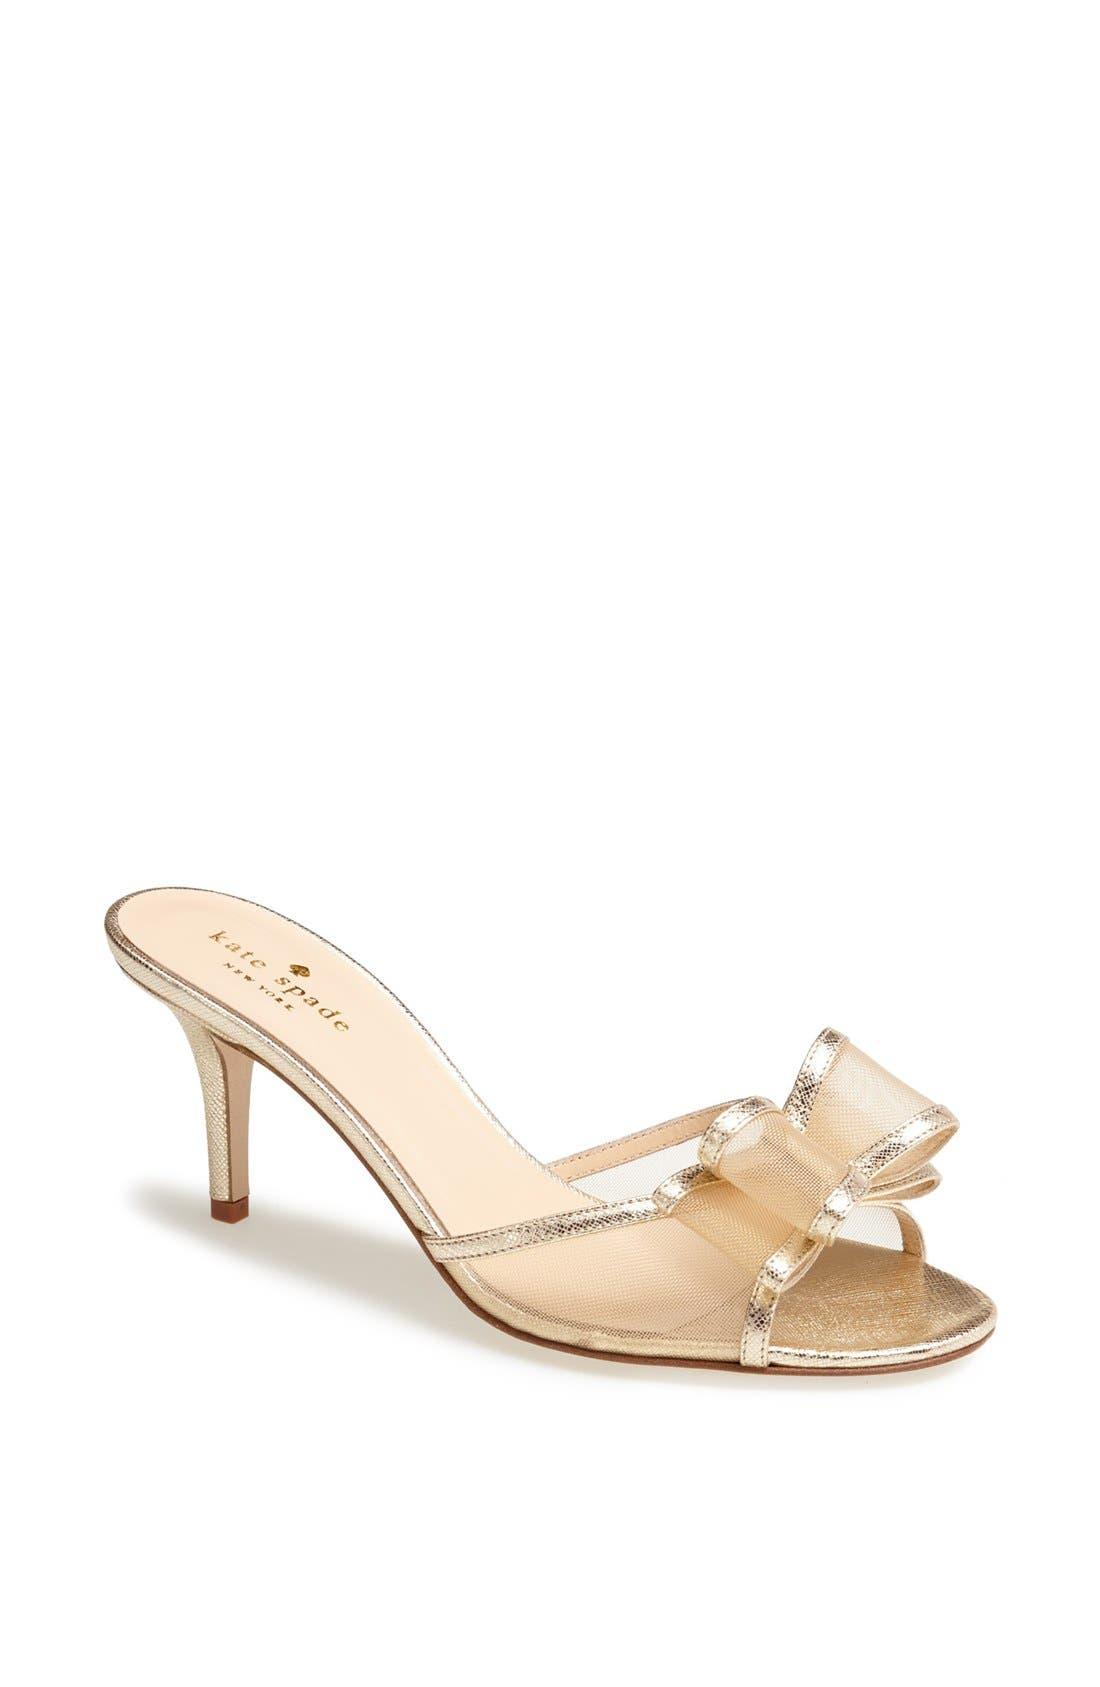 Main Image - kate spade new york 'michaela' sandal